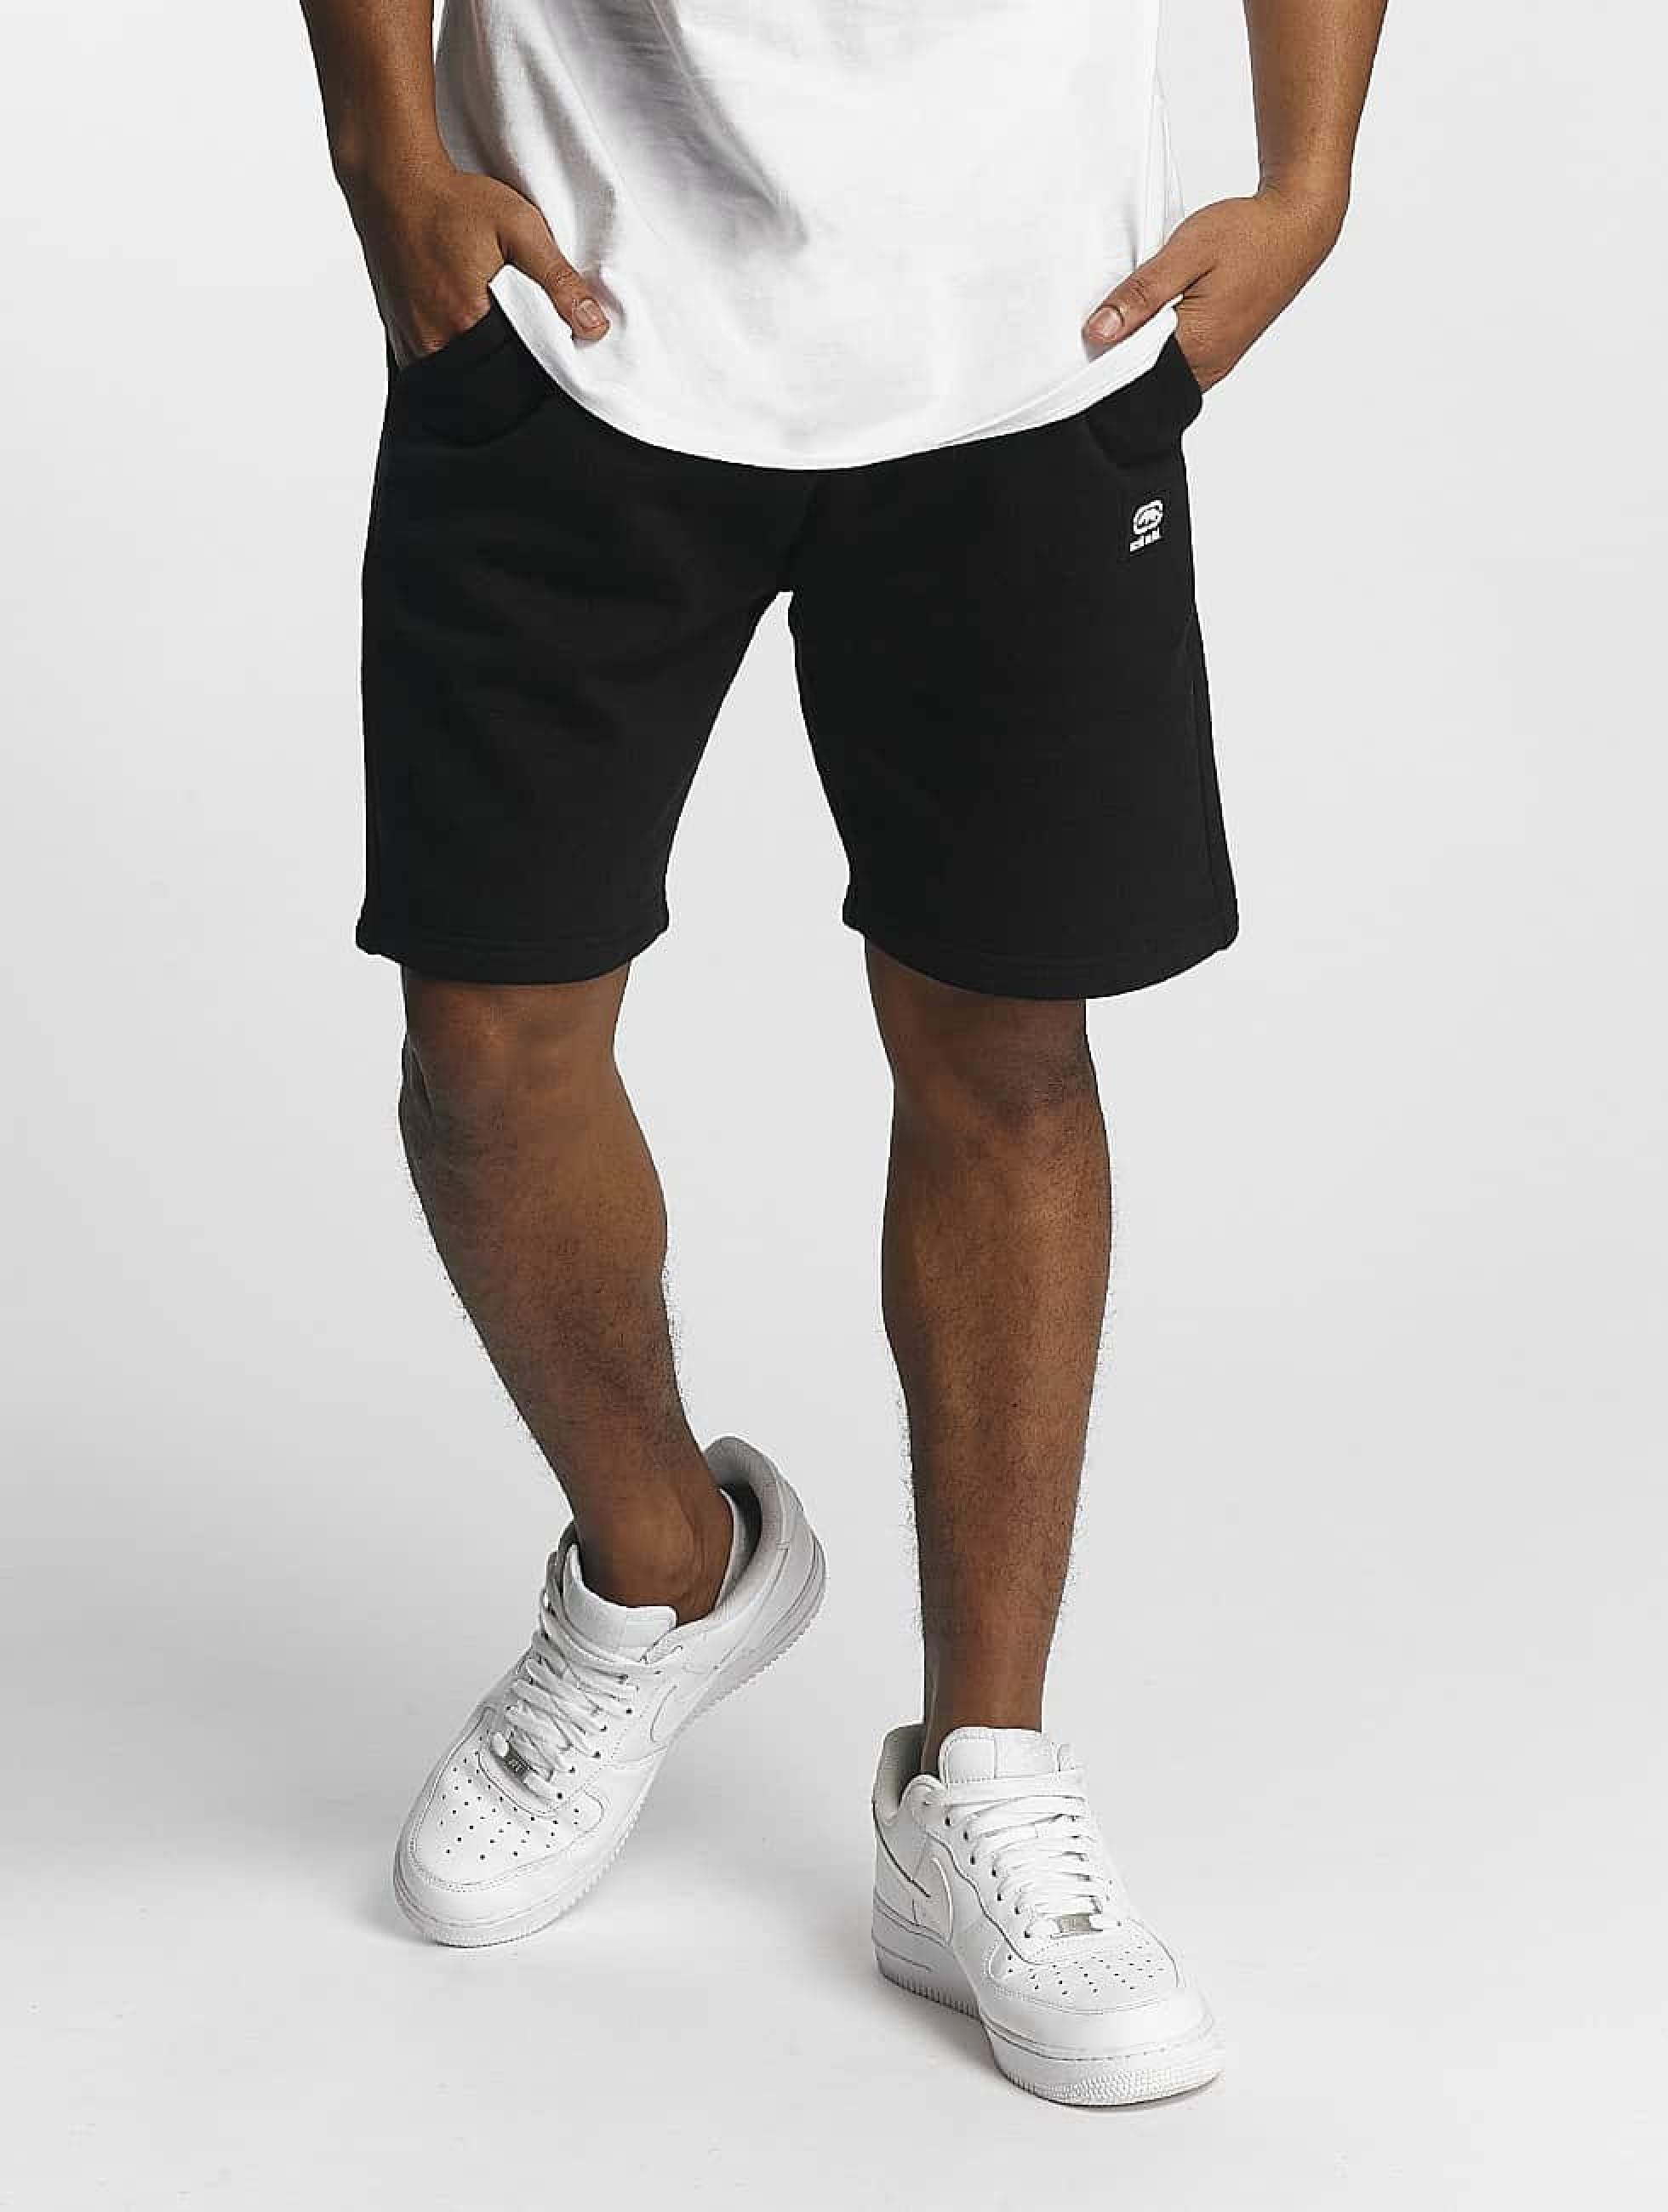 Ecko Unltd. / Short SkeletonCoast in black 5XL